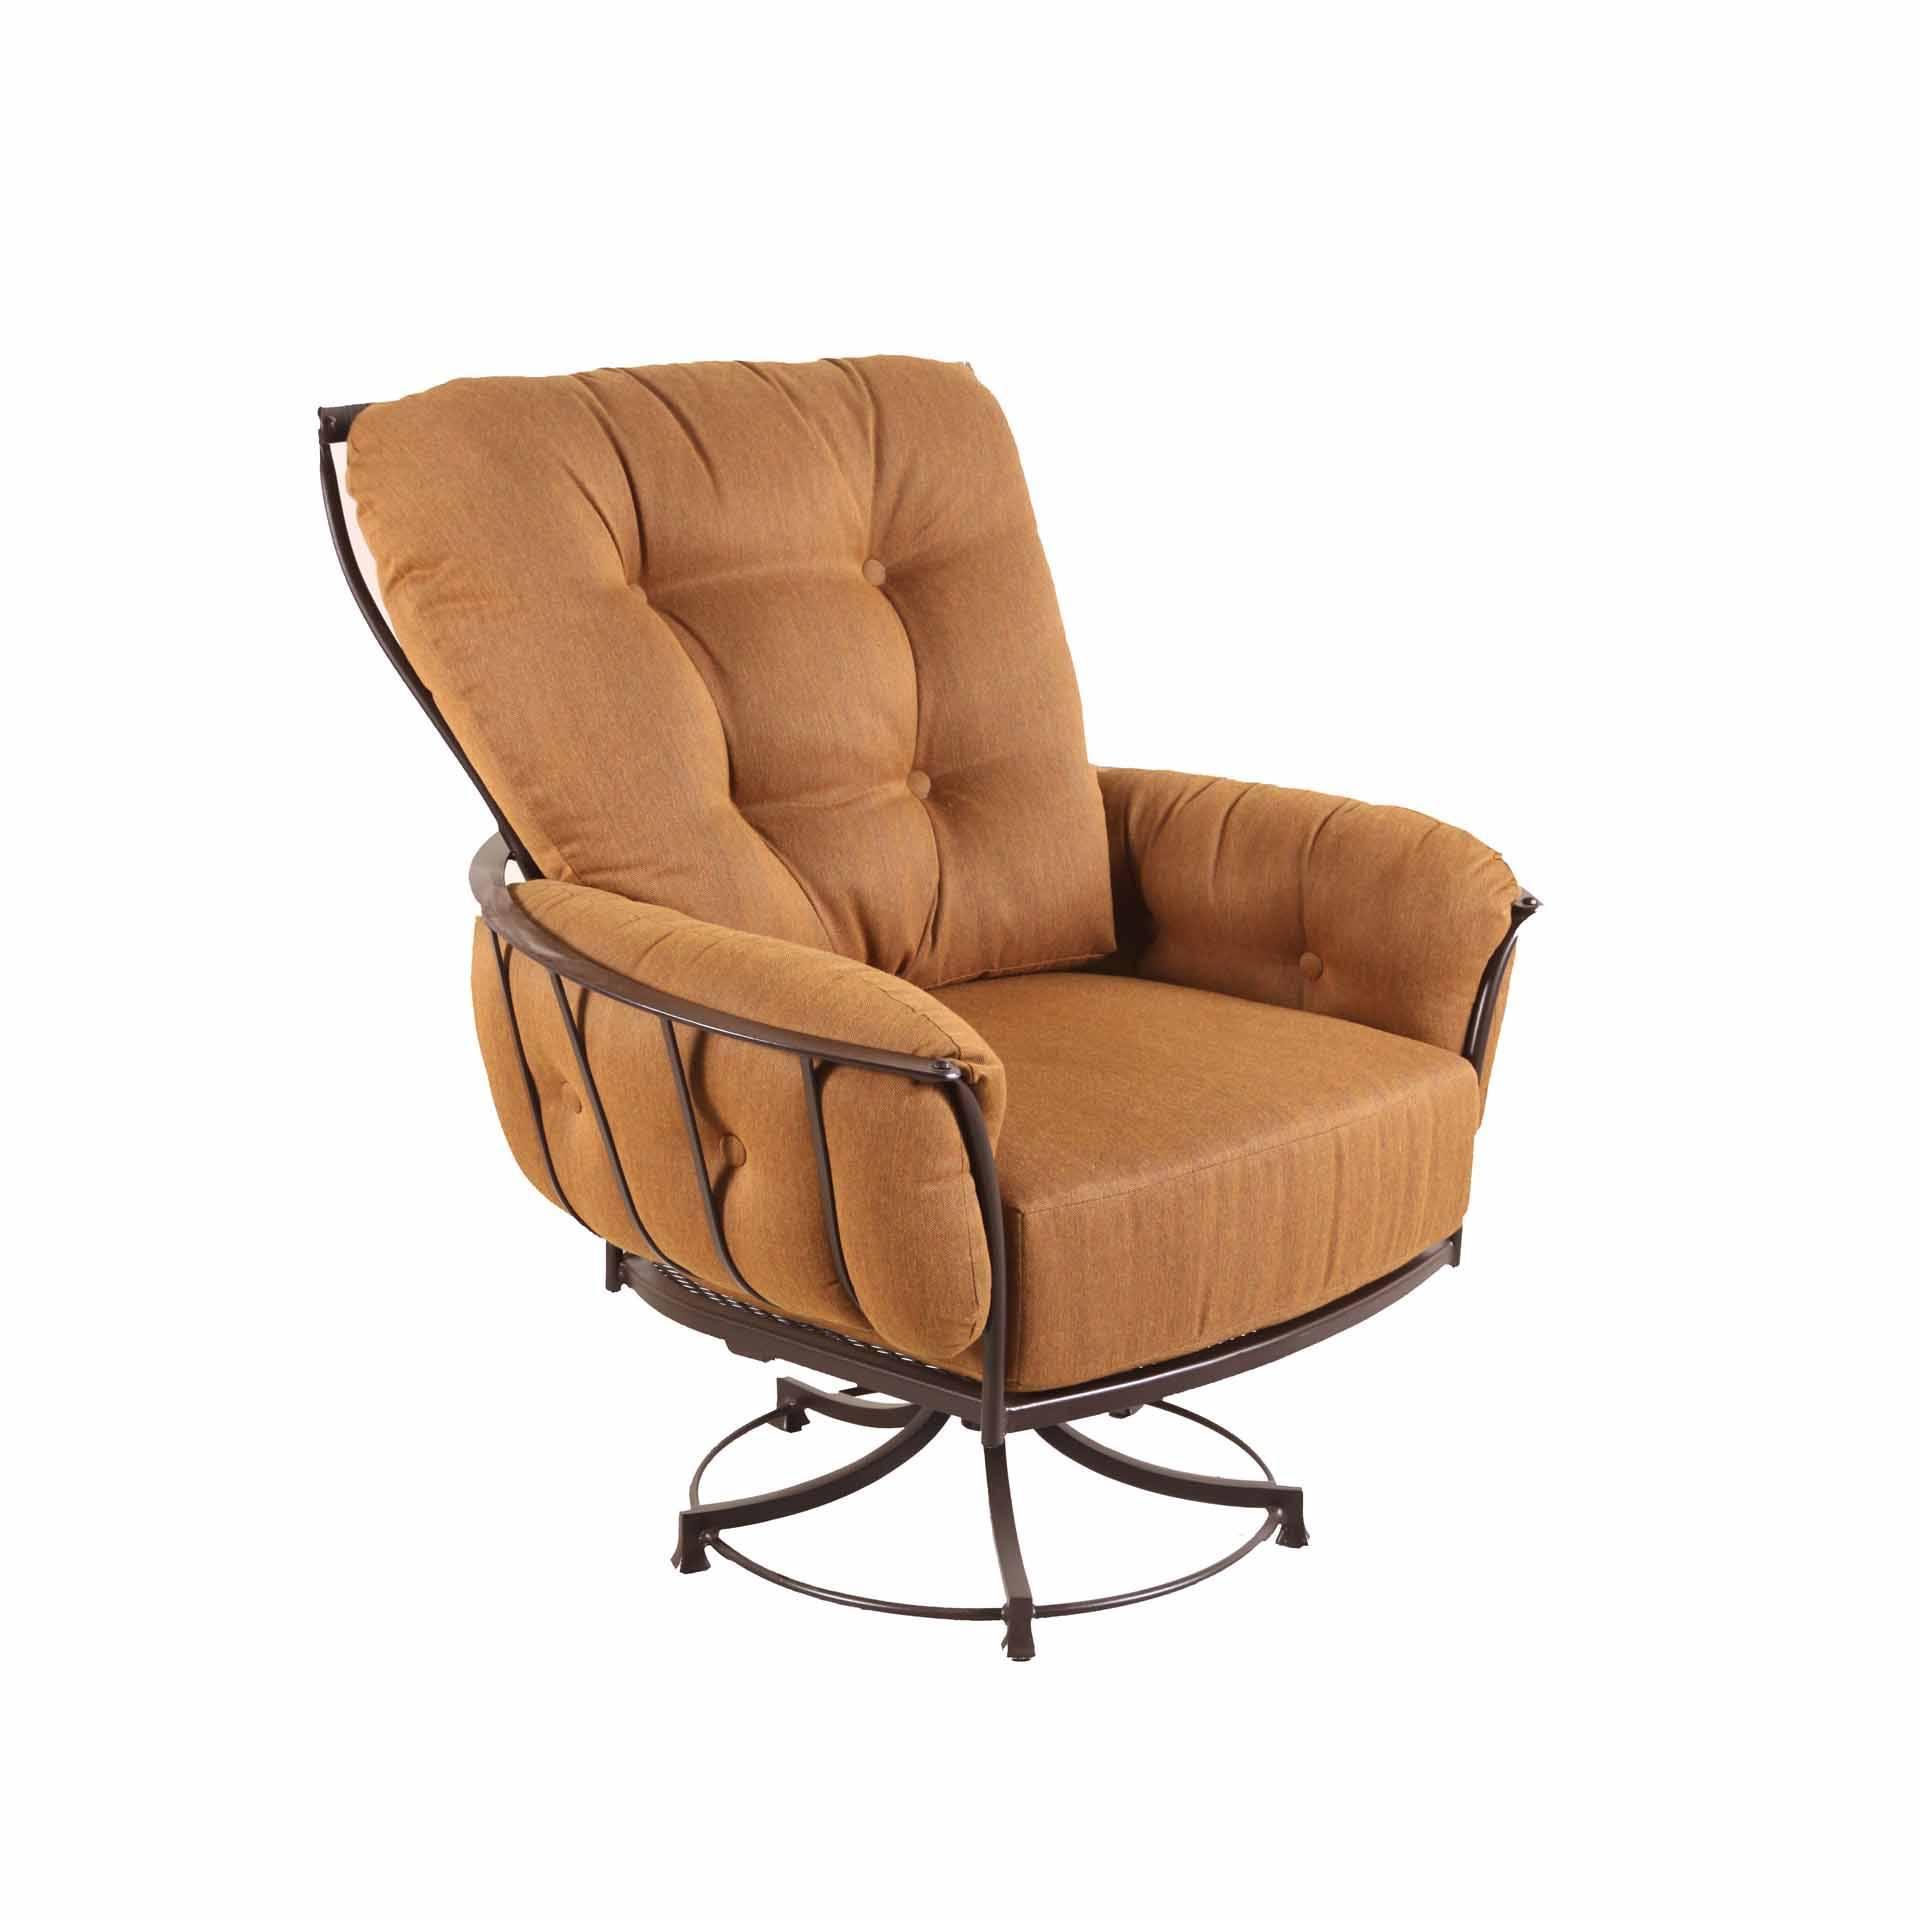 Ow Lee Monterra Swivel Rocker Lounge Chair Leisure Living